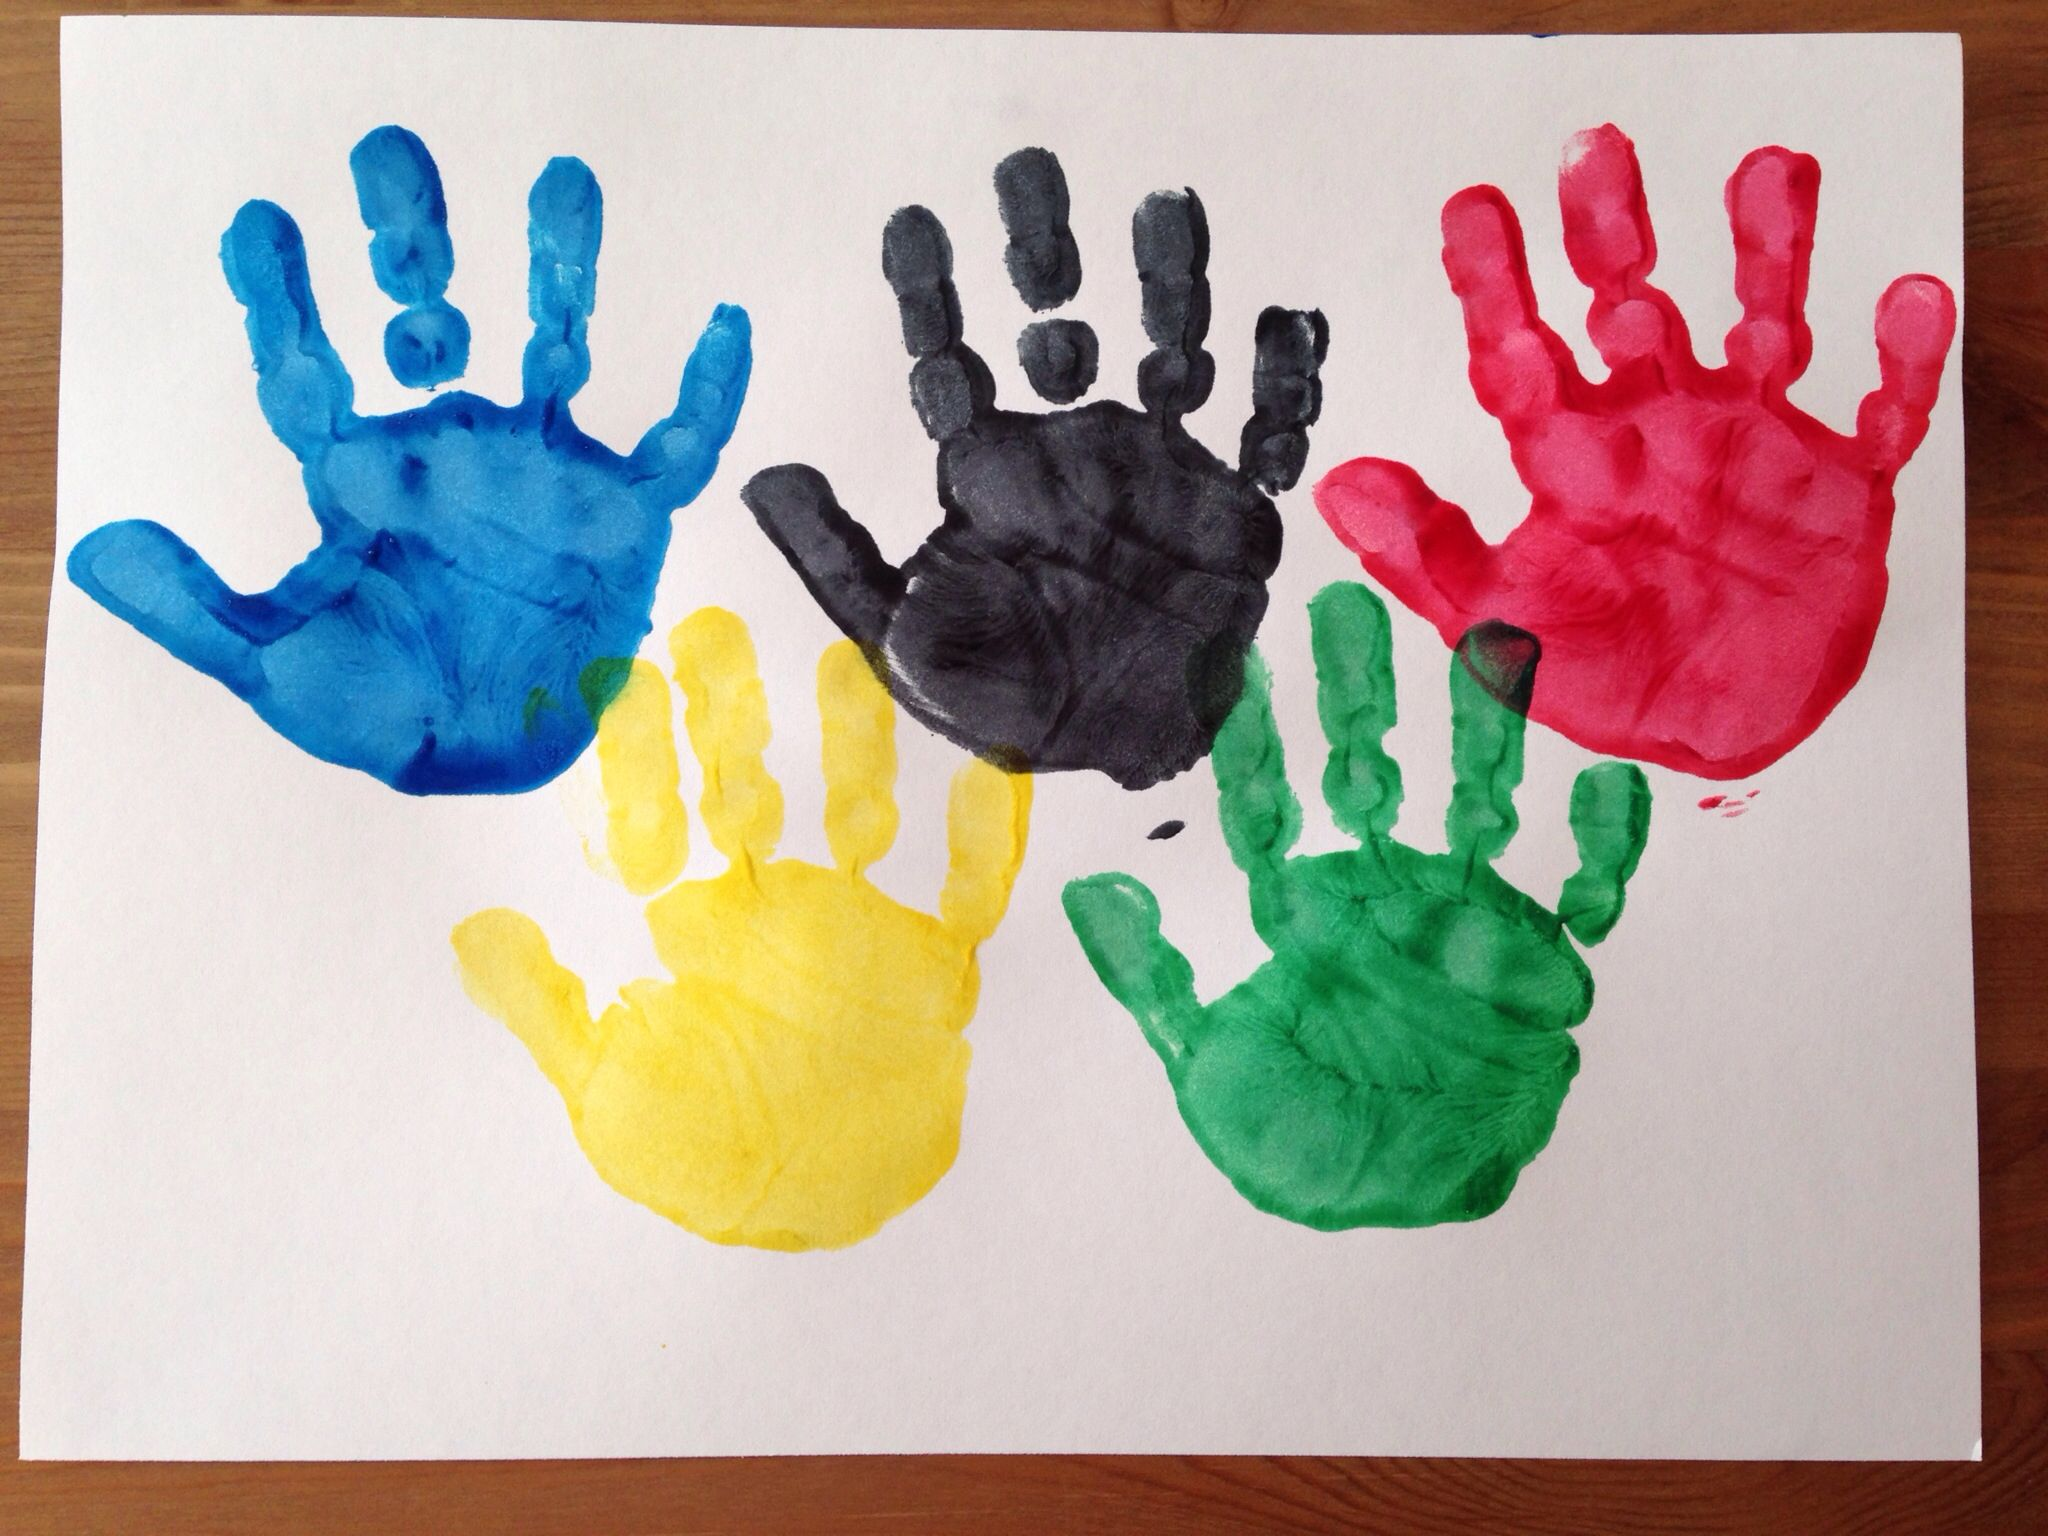 Handprint Olympic Rings Craft